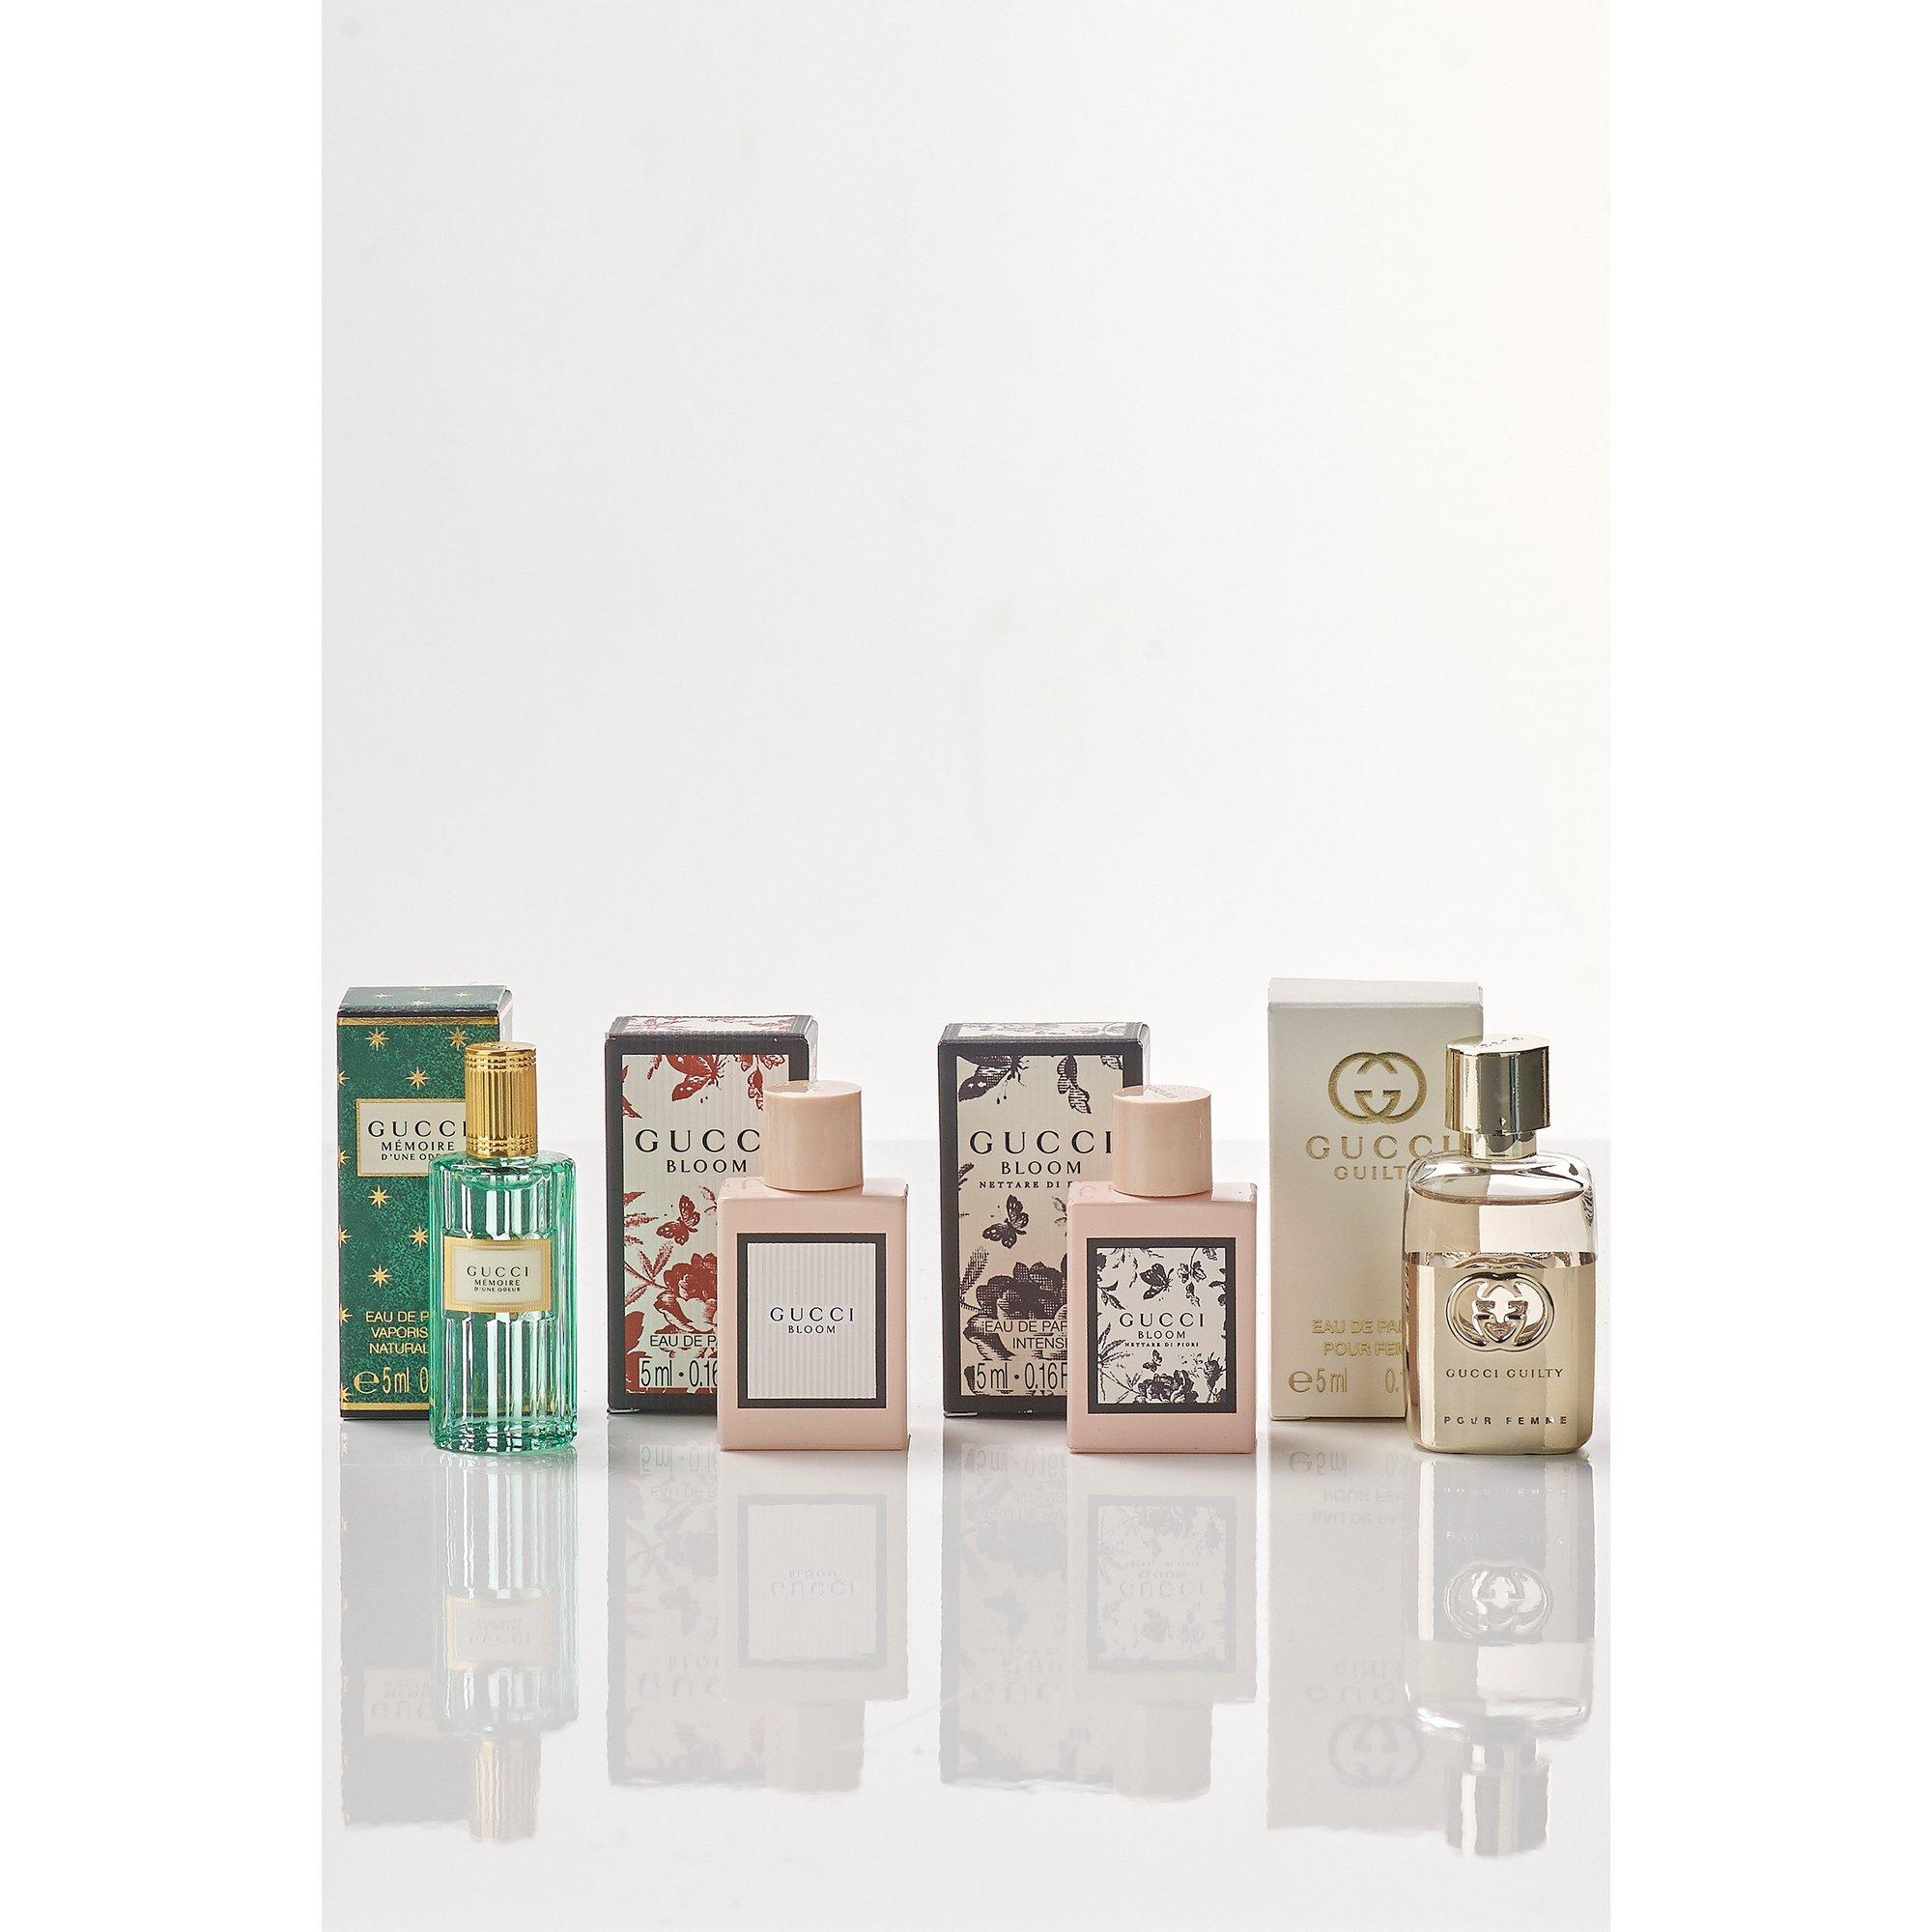 Image of Gucci Femme Miniature EDP Fragrance Set